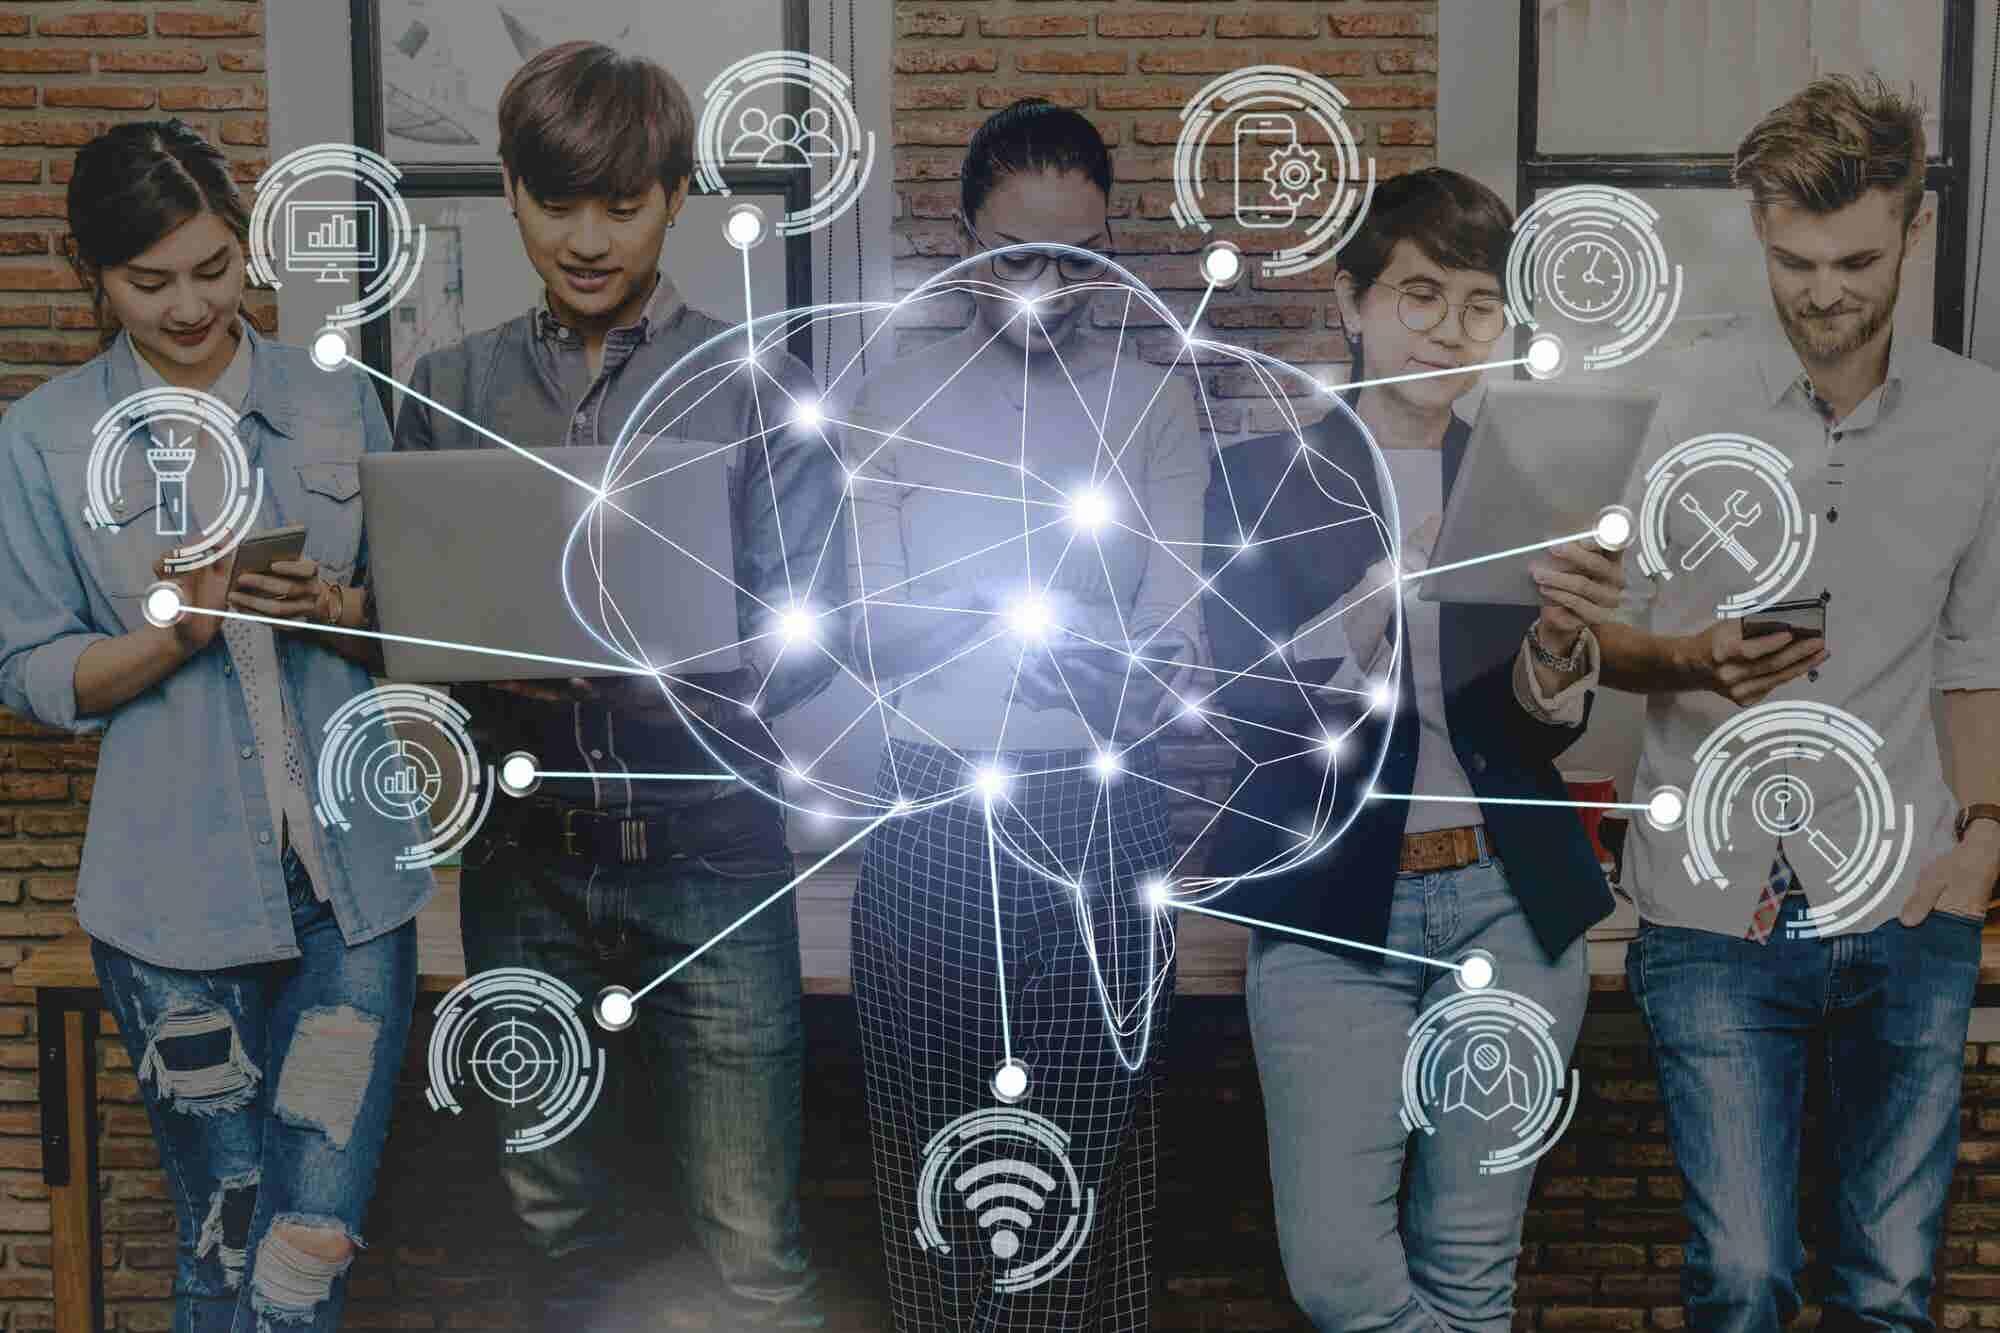 How Integrating AI Into Recruitment Can Benefit Companies Facing a Labor Crisis